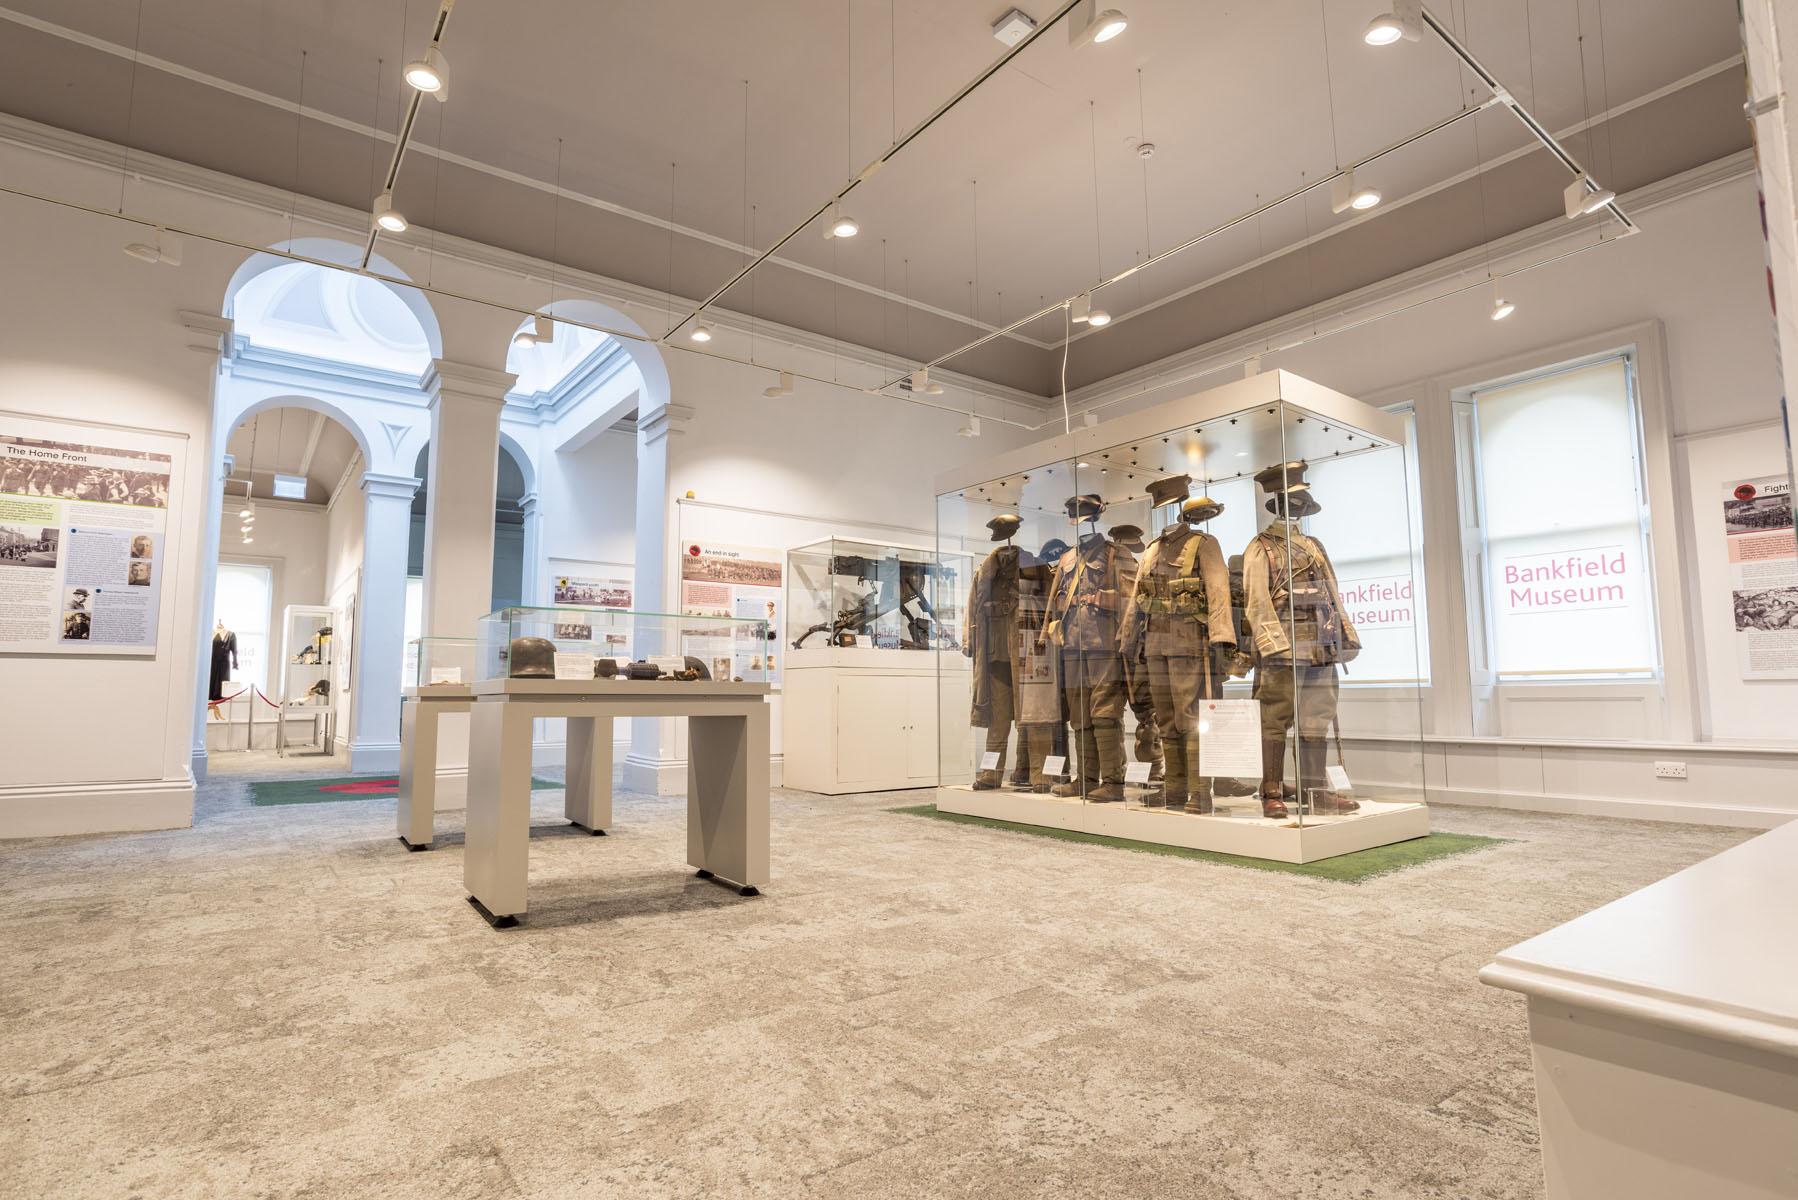 Bankfield Museum 6